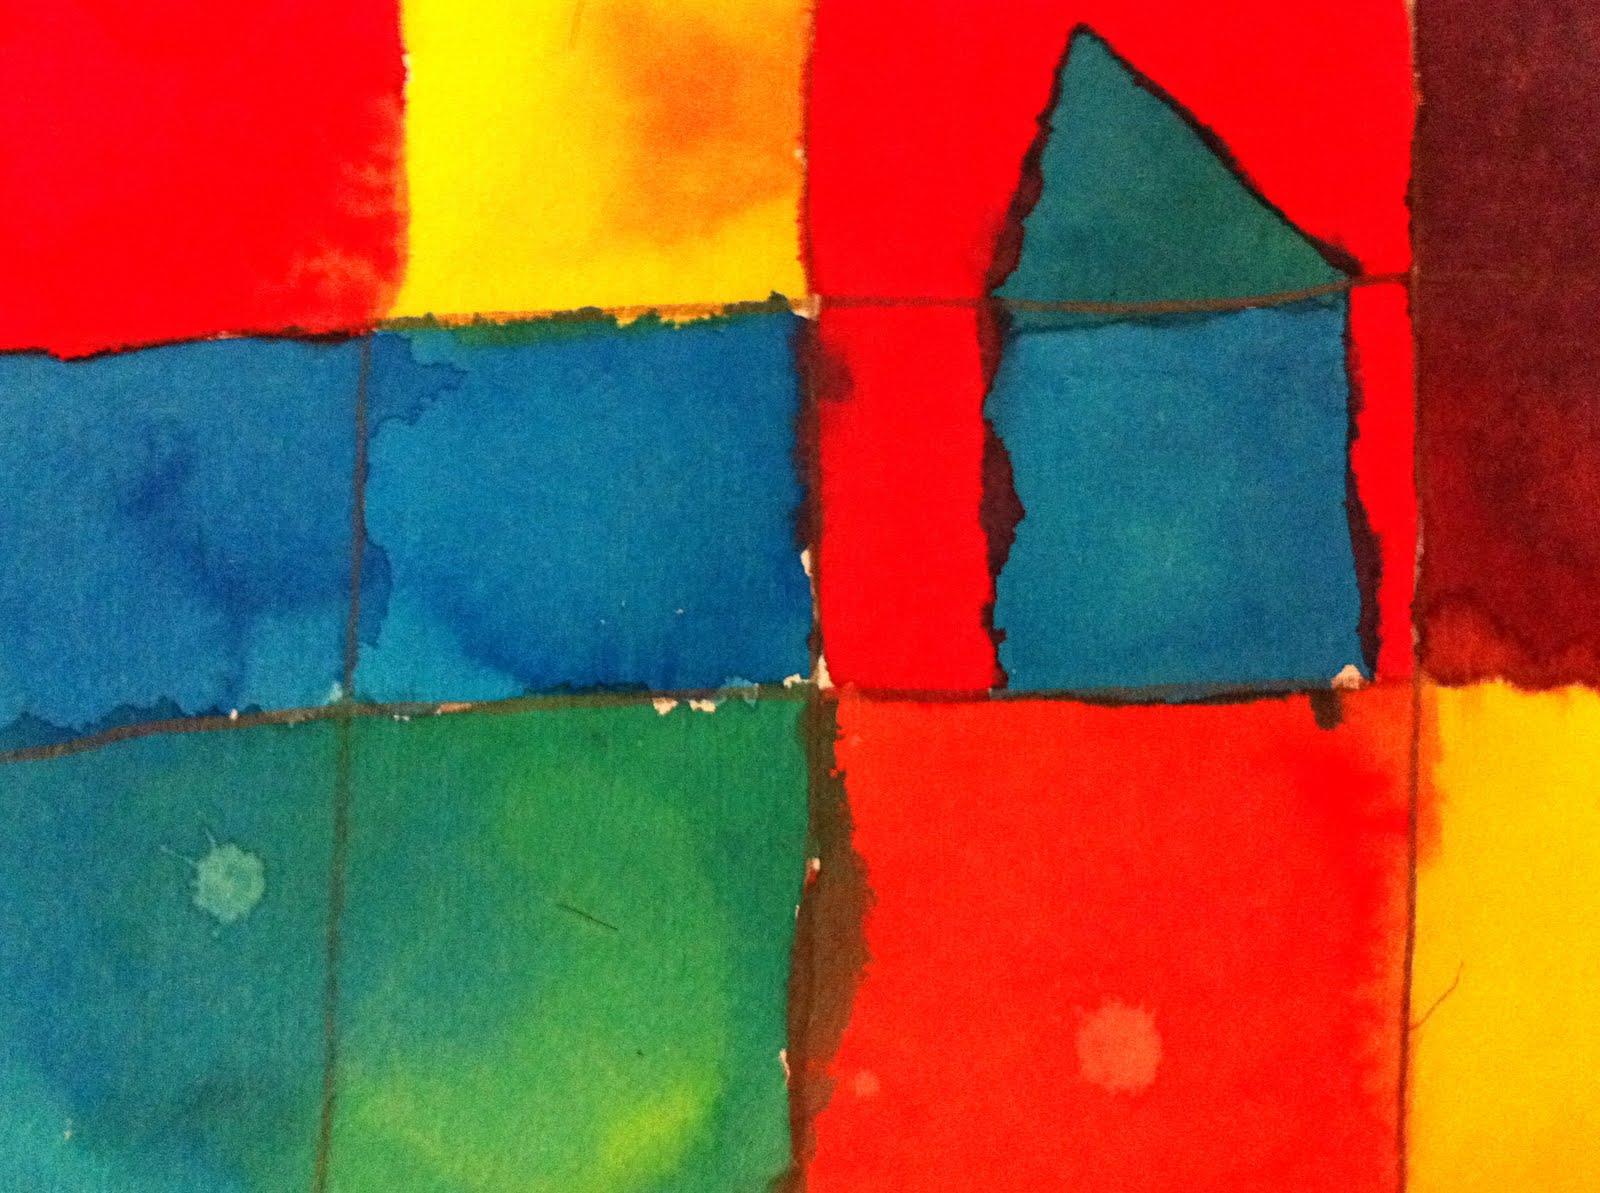 Parent Art Docents Paul Klee The Color Wheel